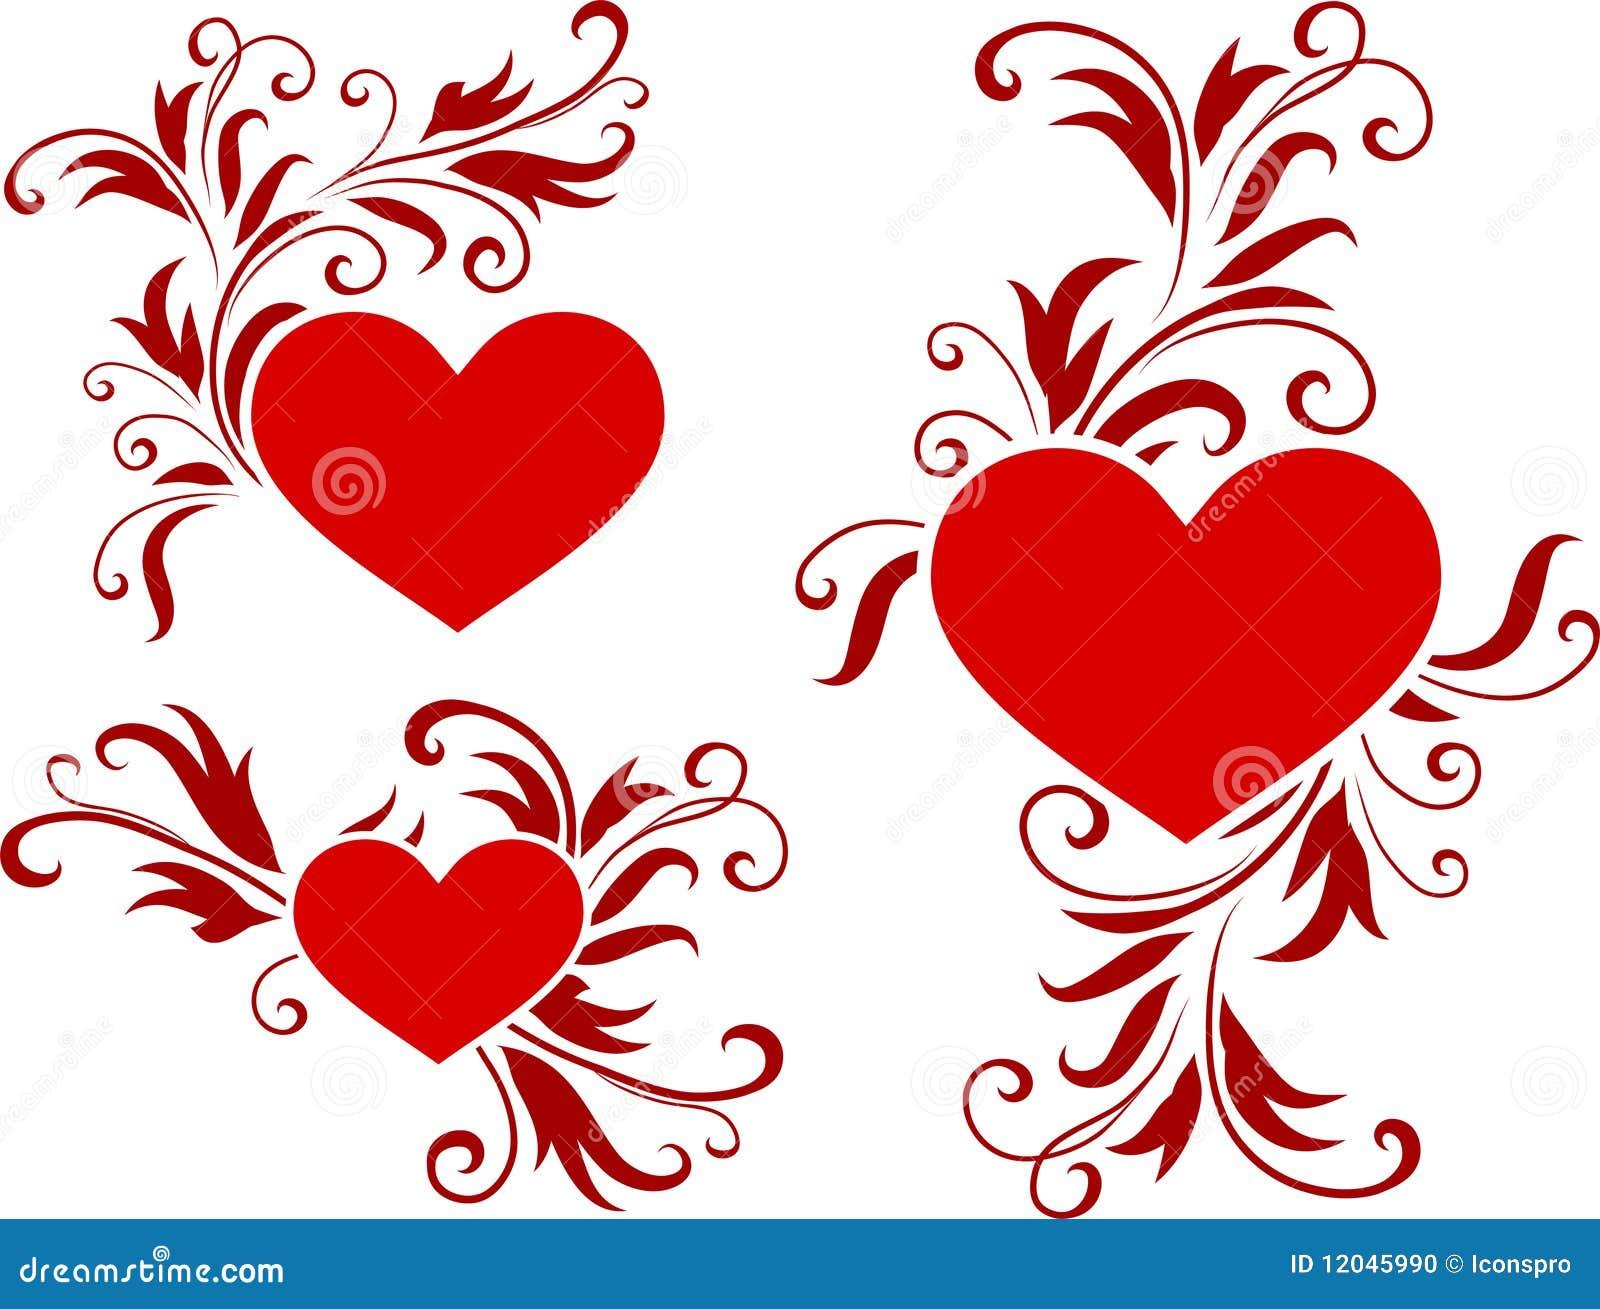 Romantic Hearts Valentine S Day Design Background Stock Vector